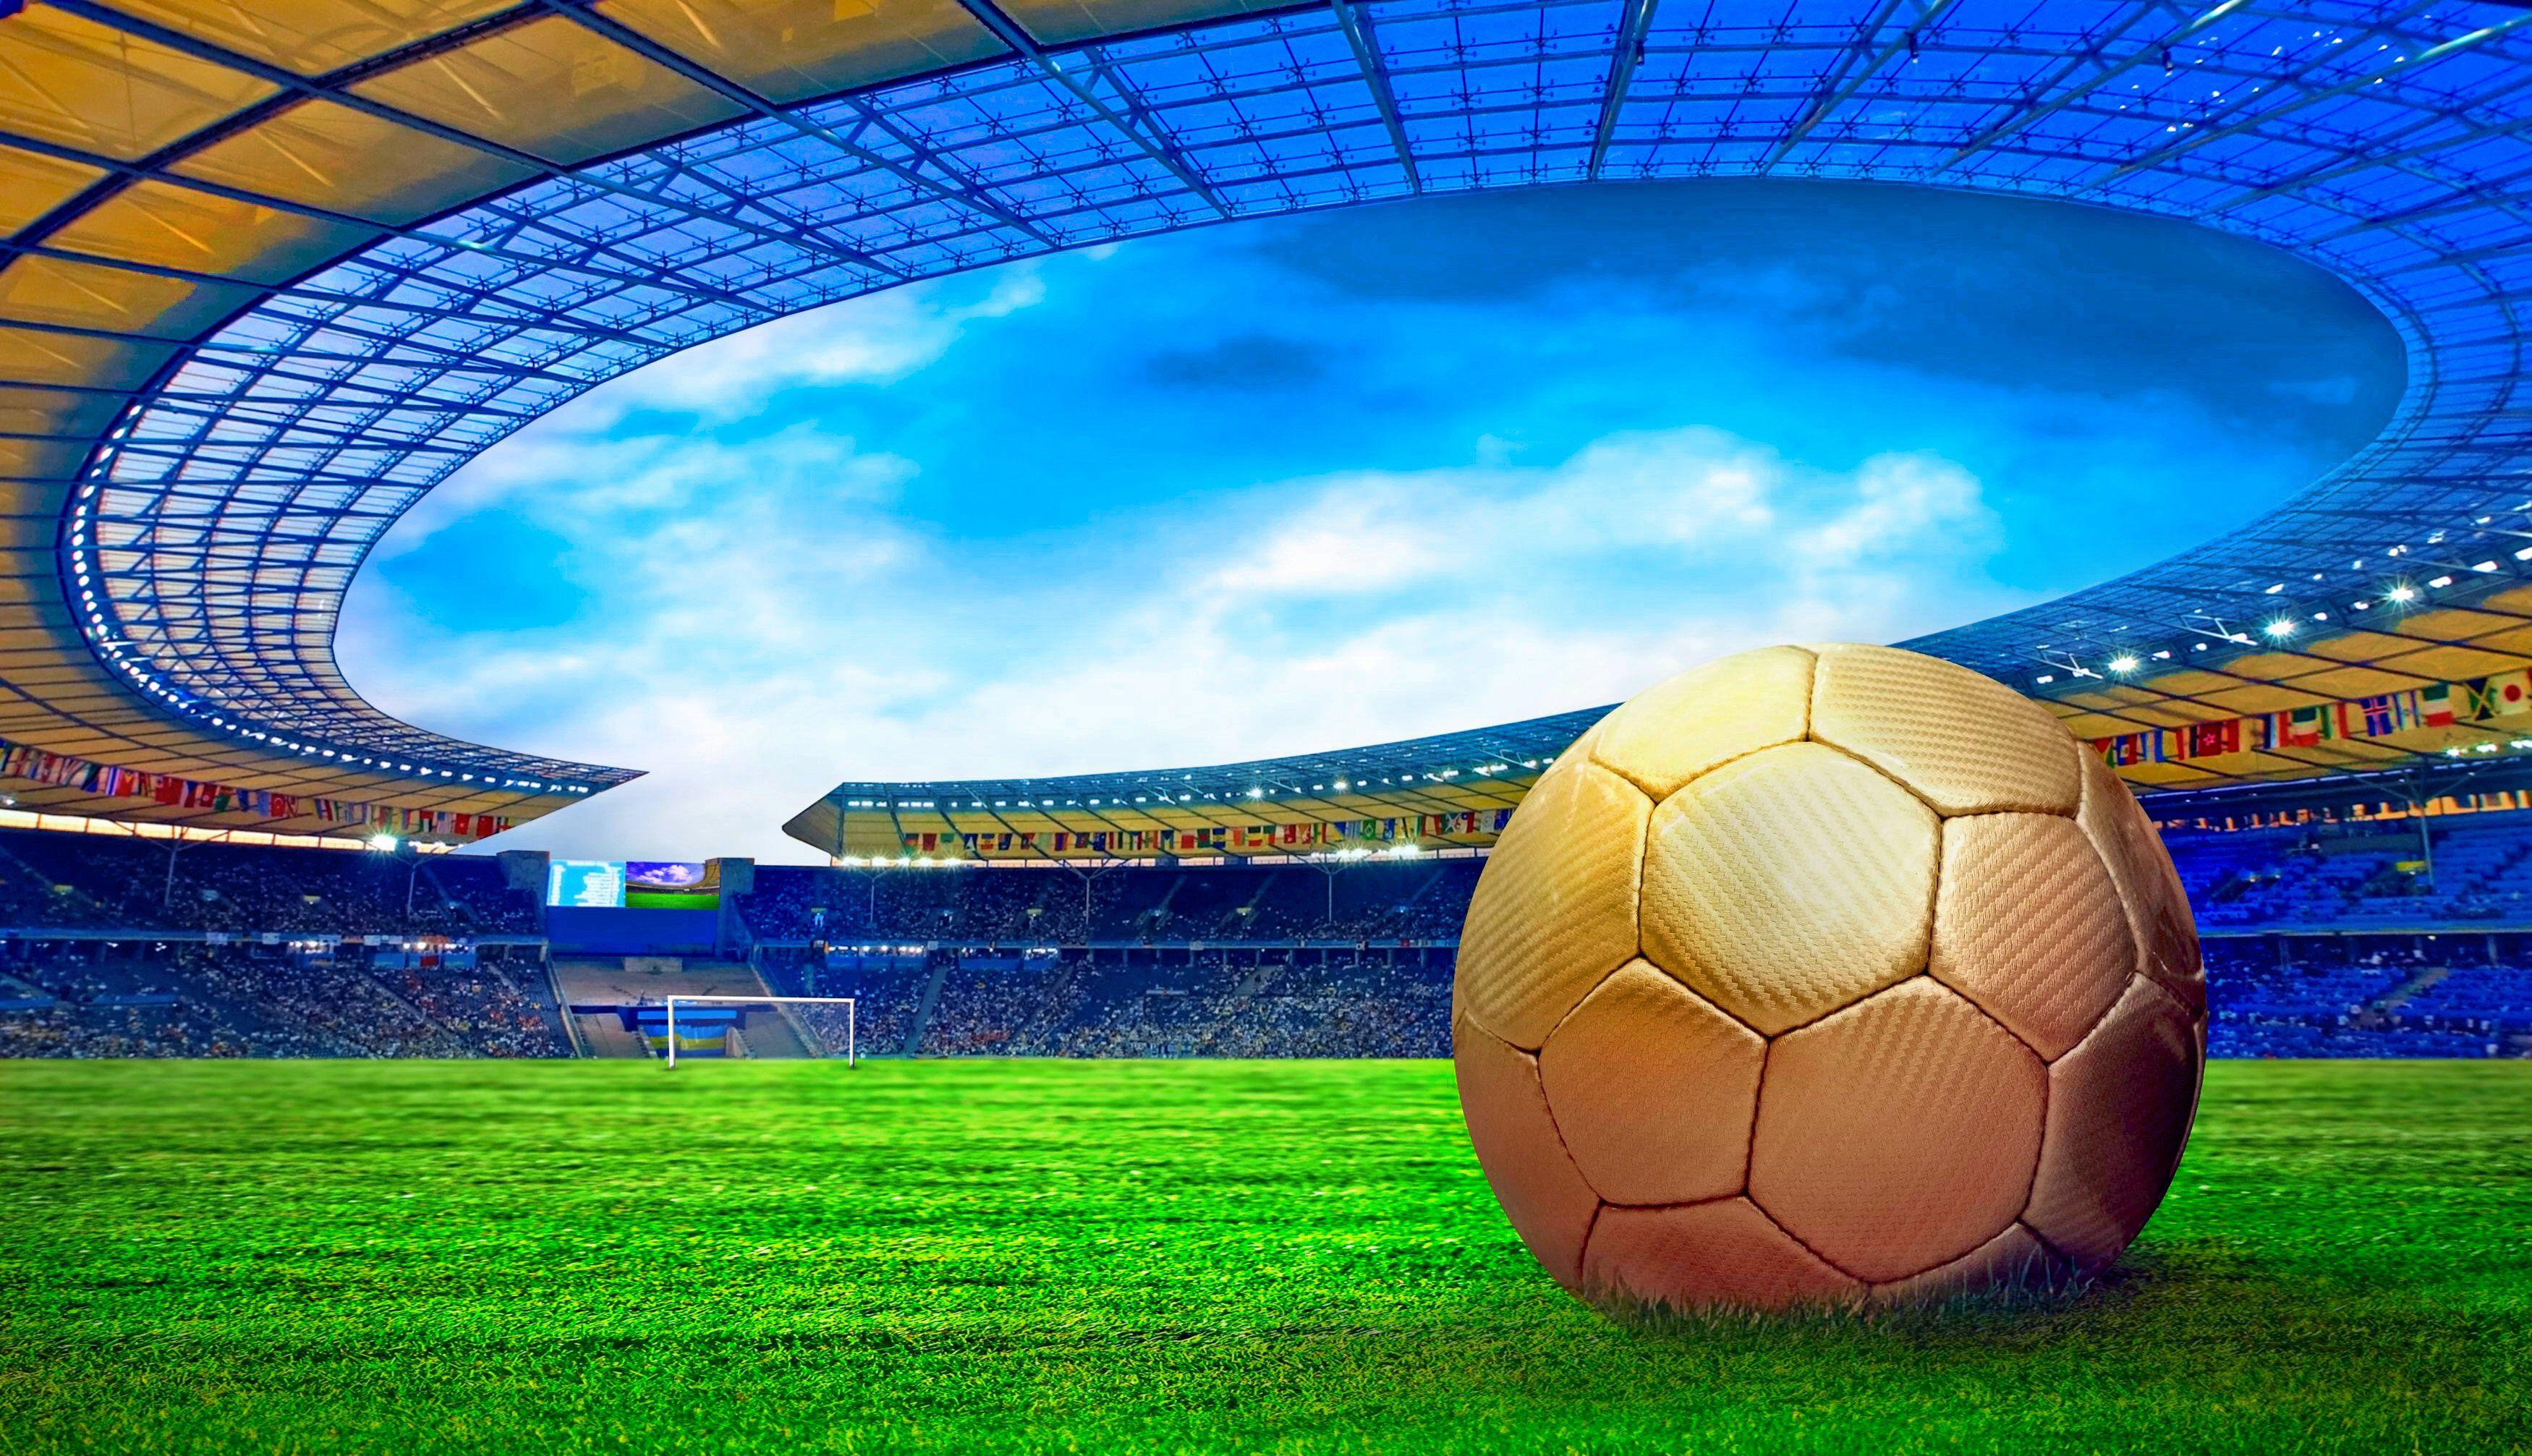 soccer stadium wallpaper, free soccer wallpaper